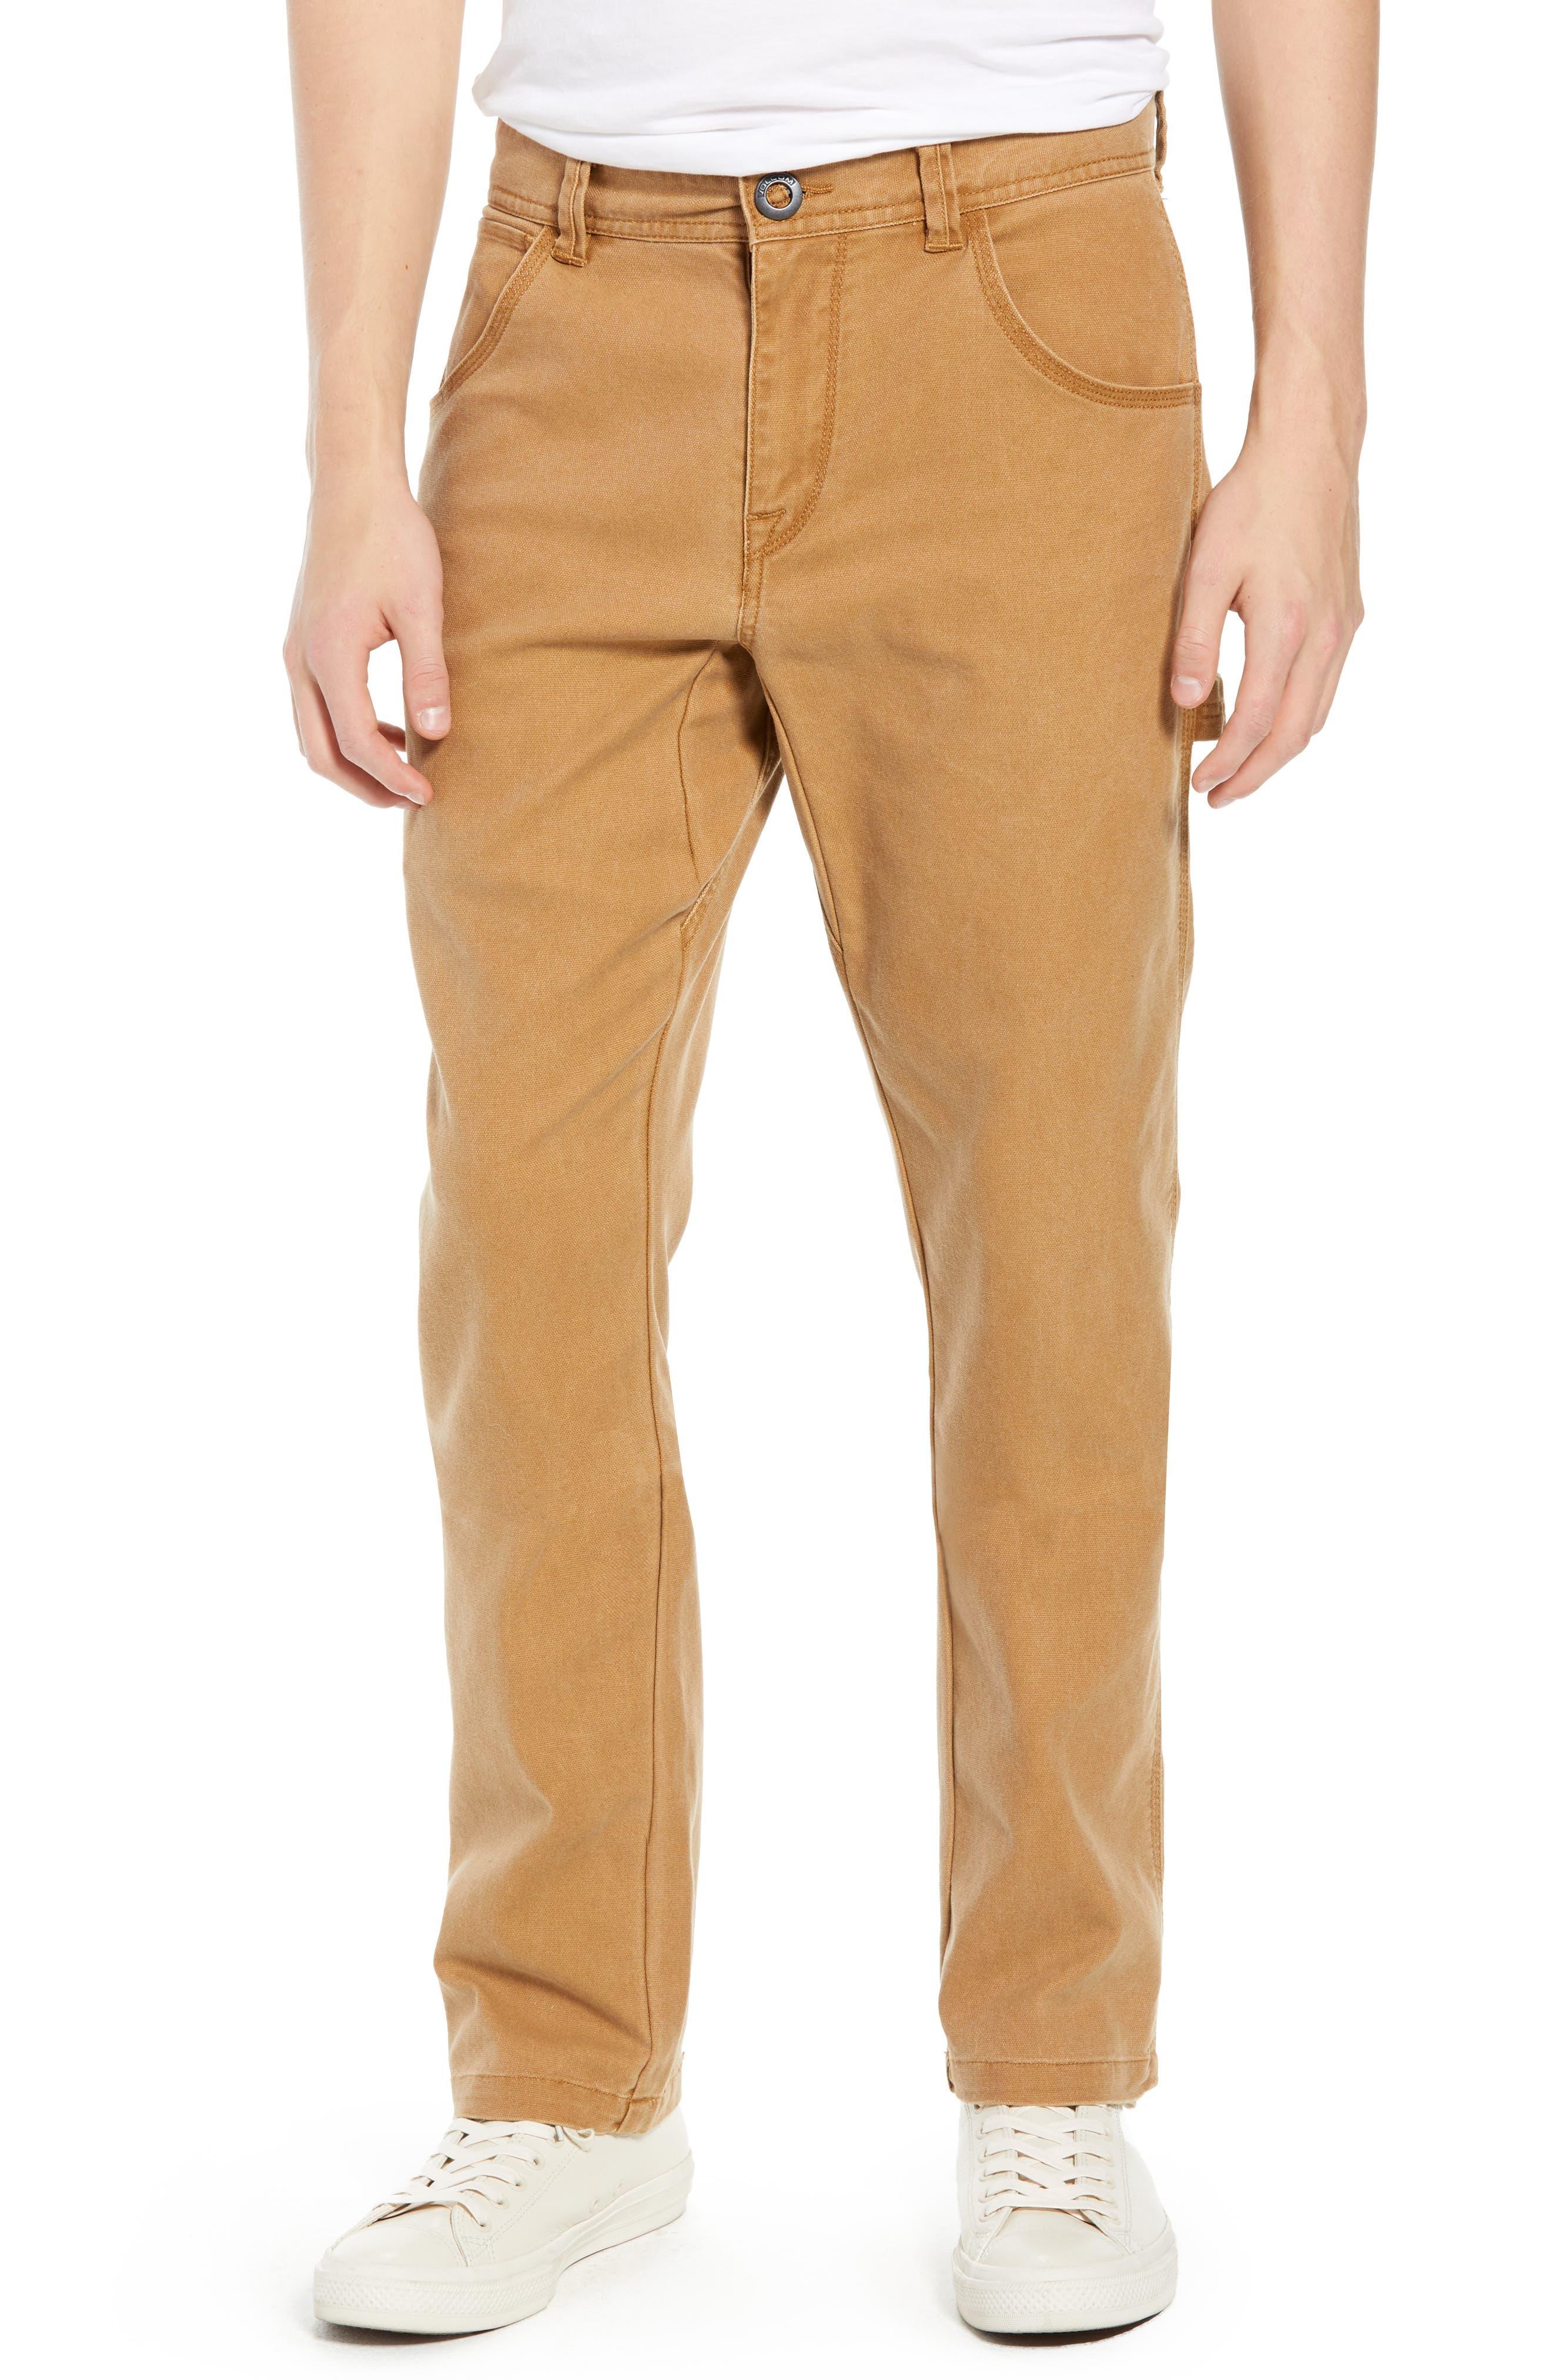 VSM Whaler Pants,                         Main,                         color, CAMEL